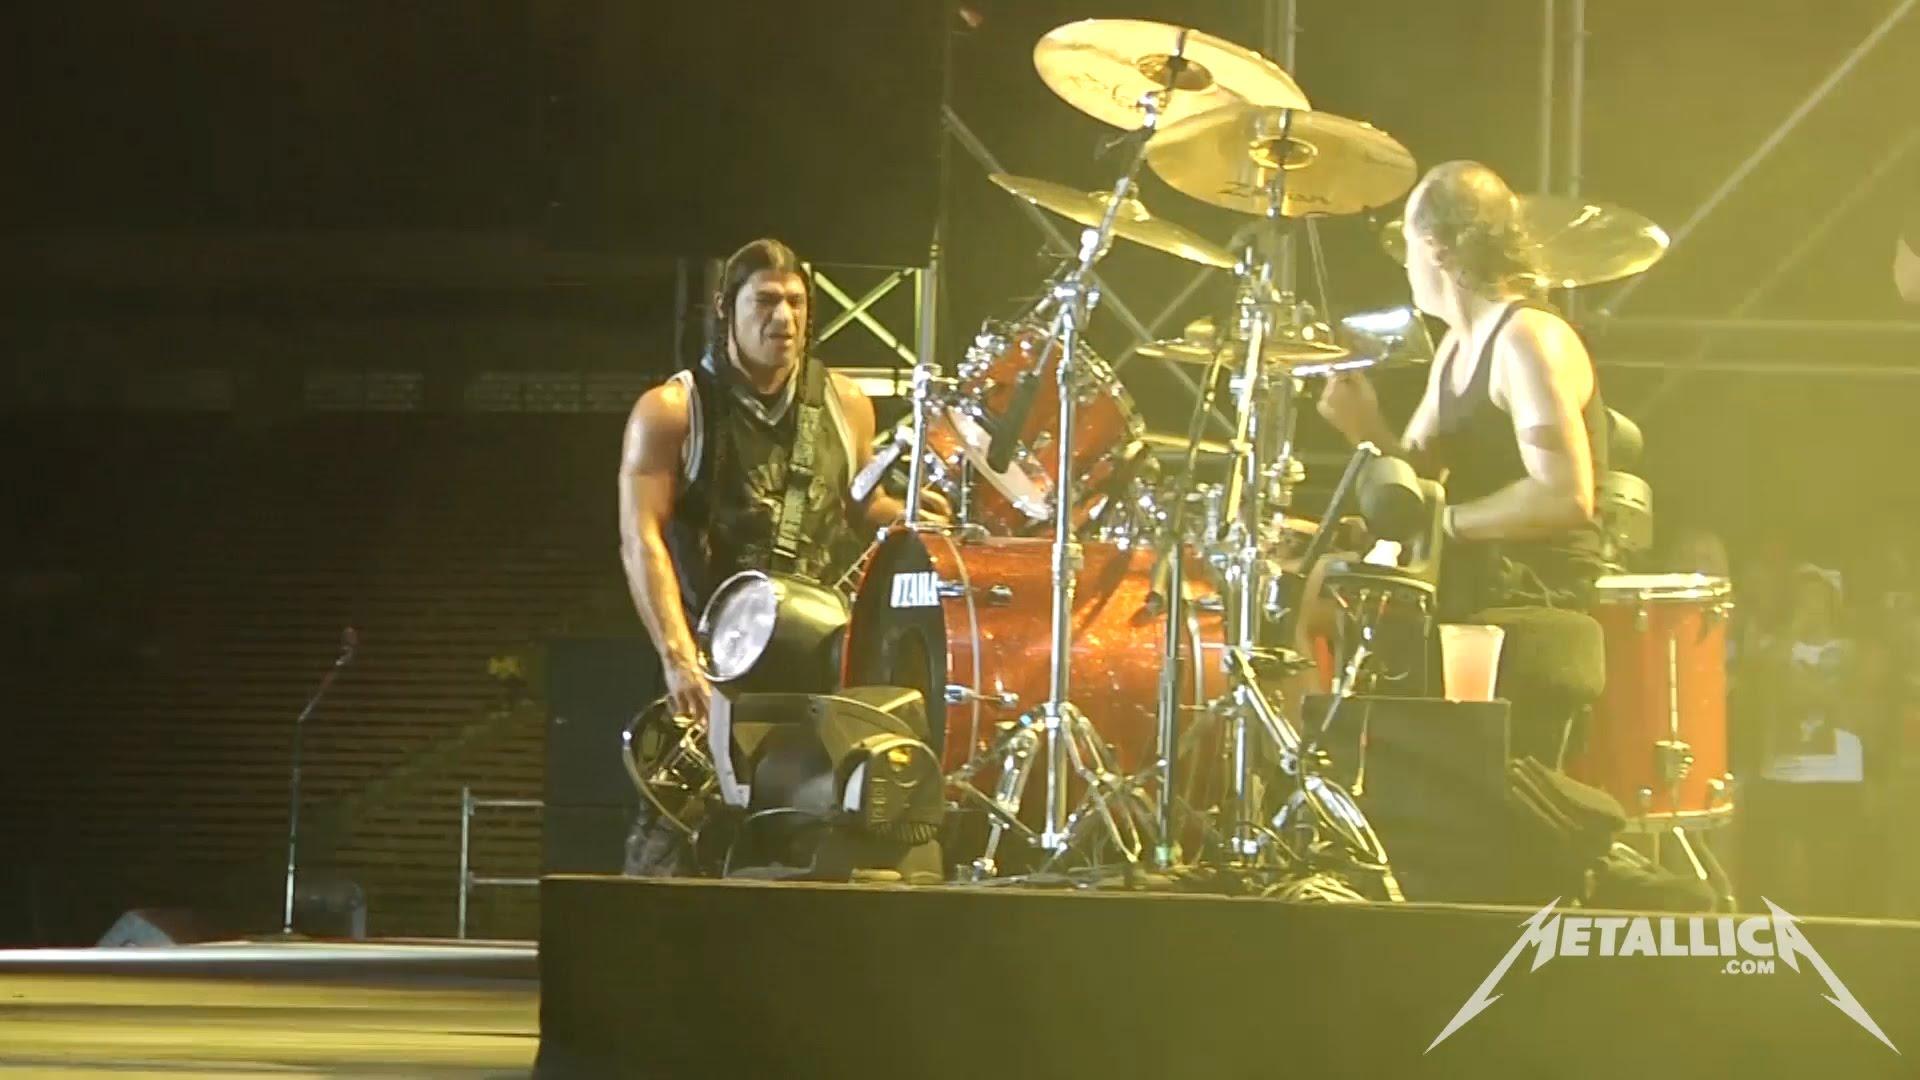 Metallica Cyanide (MetOnTour - Jakarta, Indonesia - 2013)